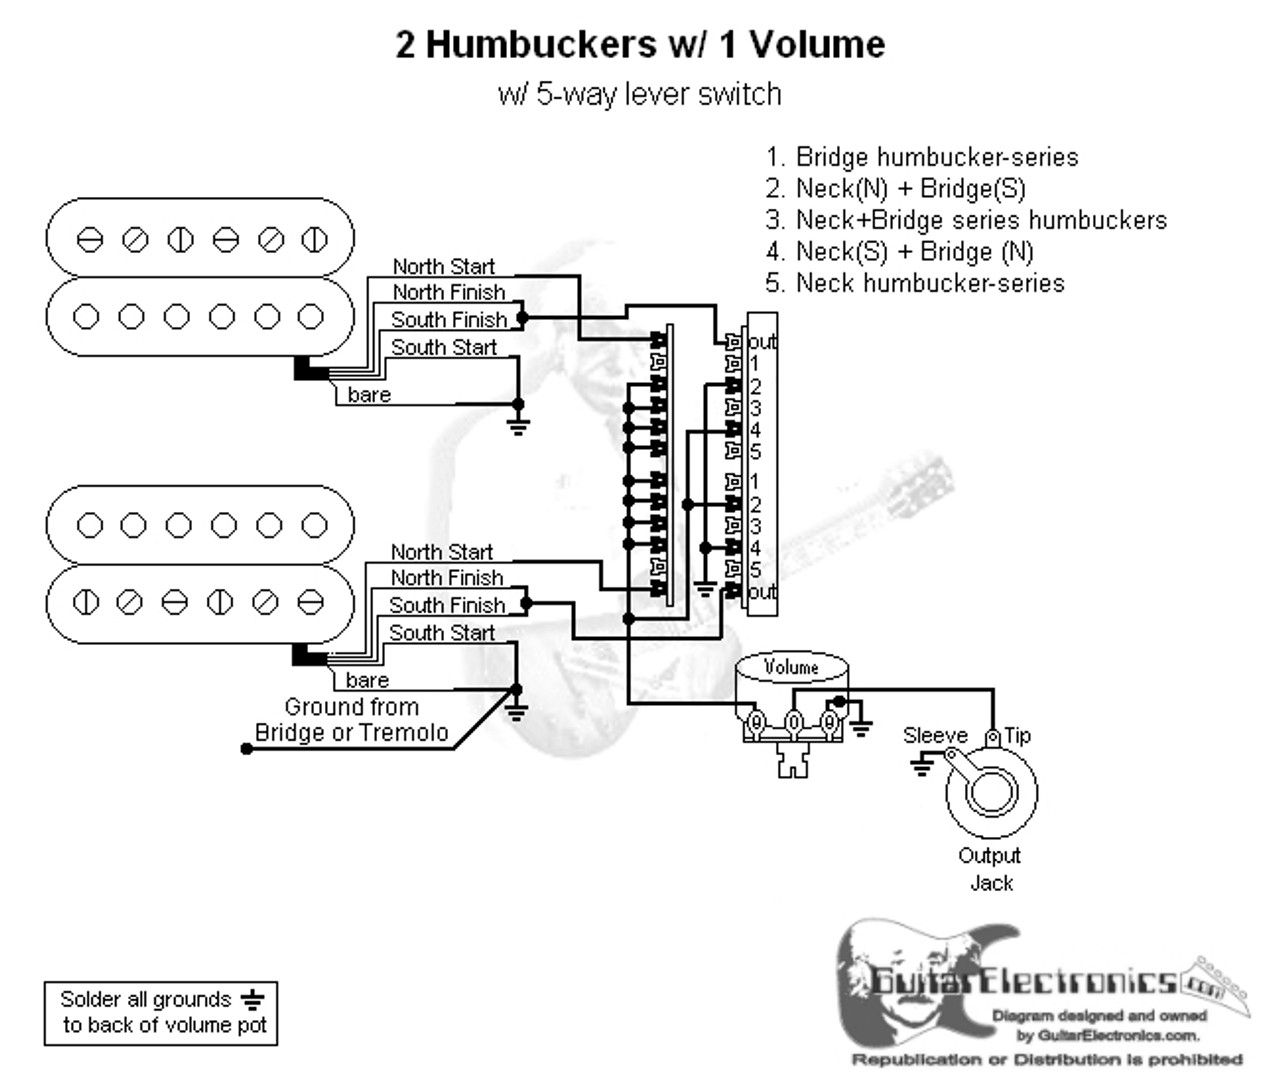 Guitar Wiring Diagram 2 Humbucker 1 Volume